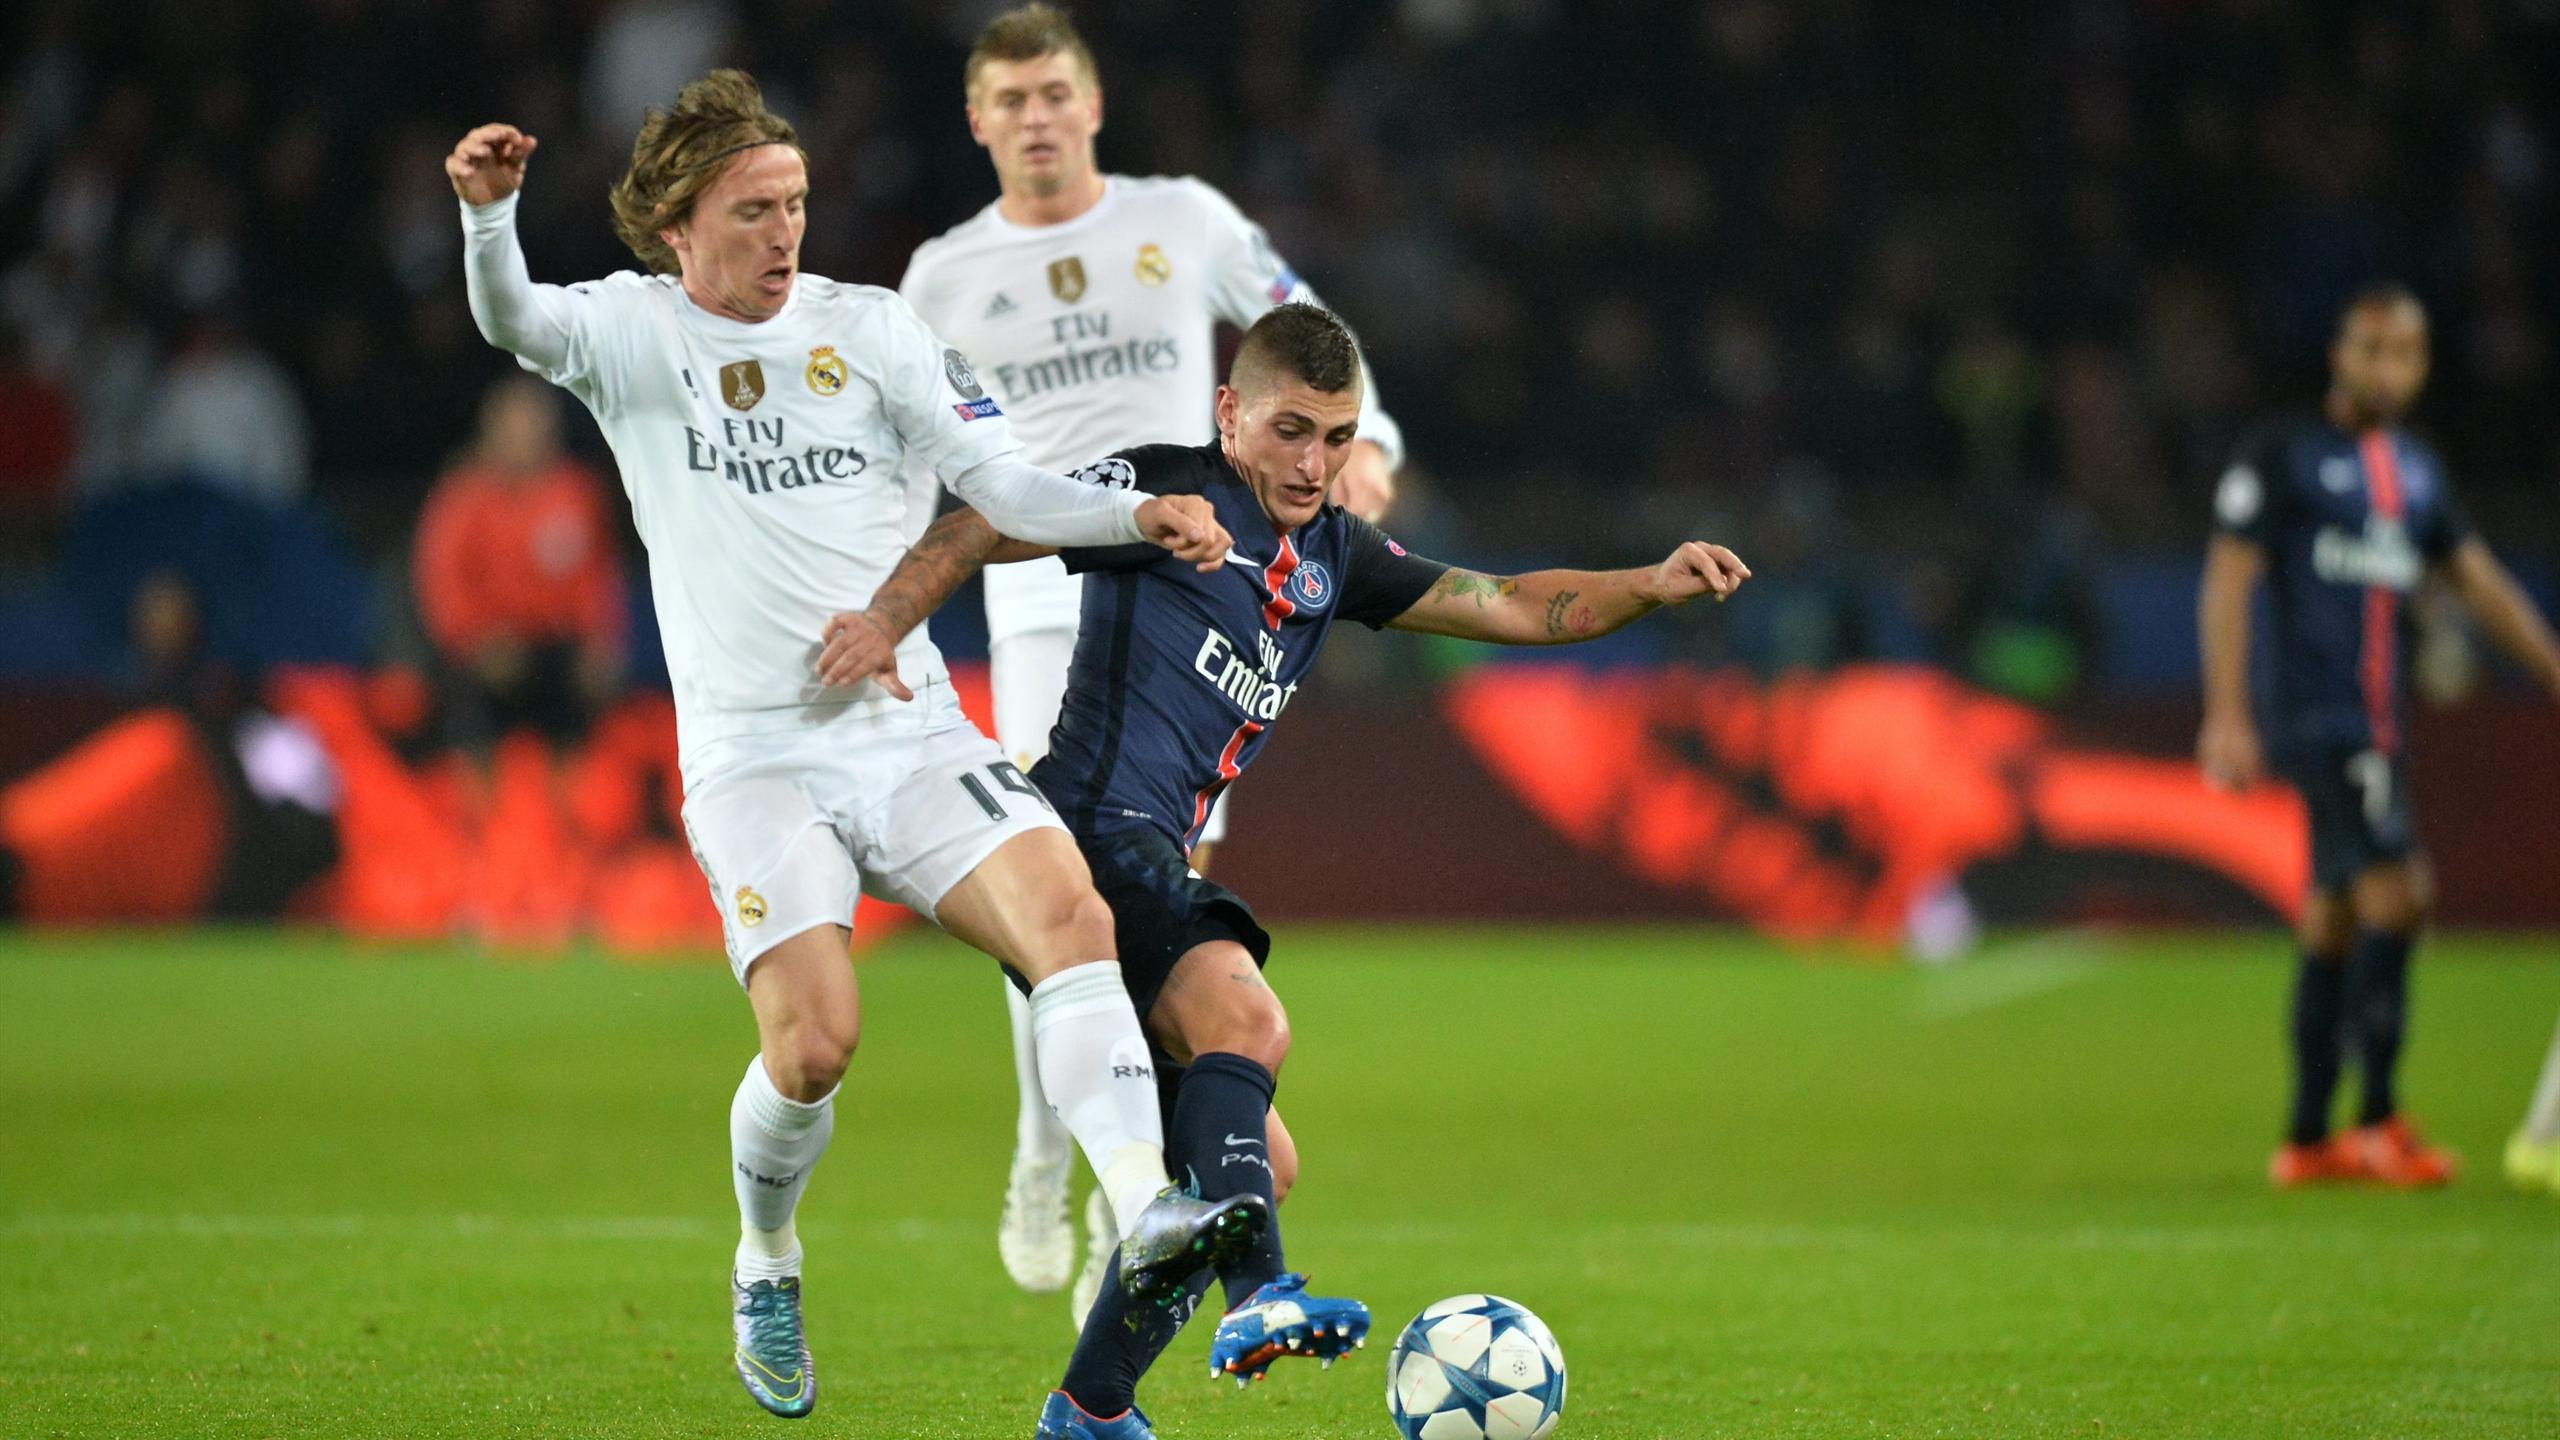 Marco Verratti au duel avec Luka Modric lors de PSG-Real Madrid